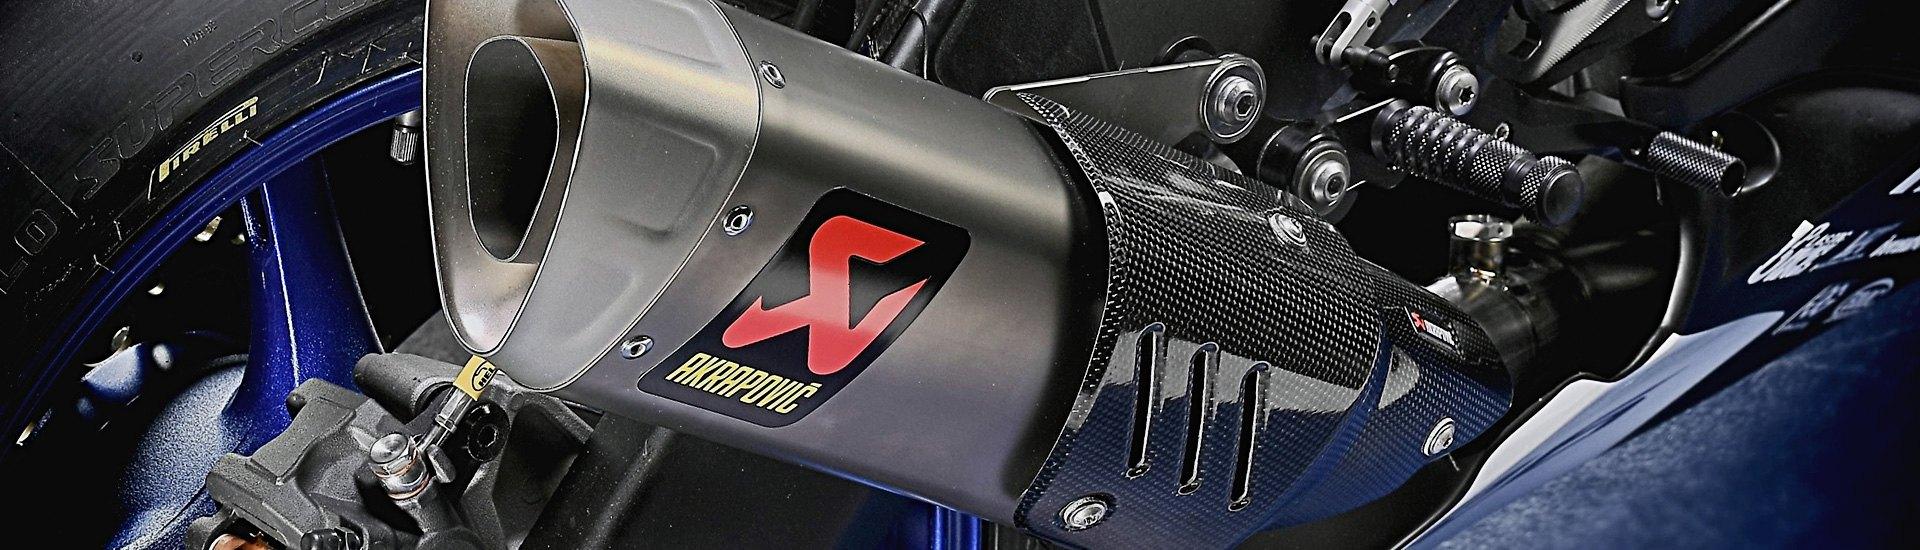 honda cbr600rr exhaust parts mufflers